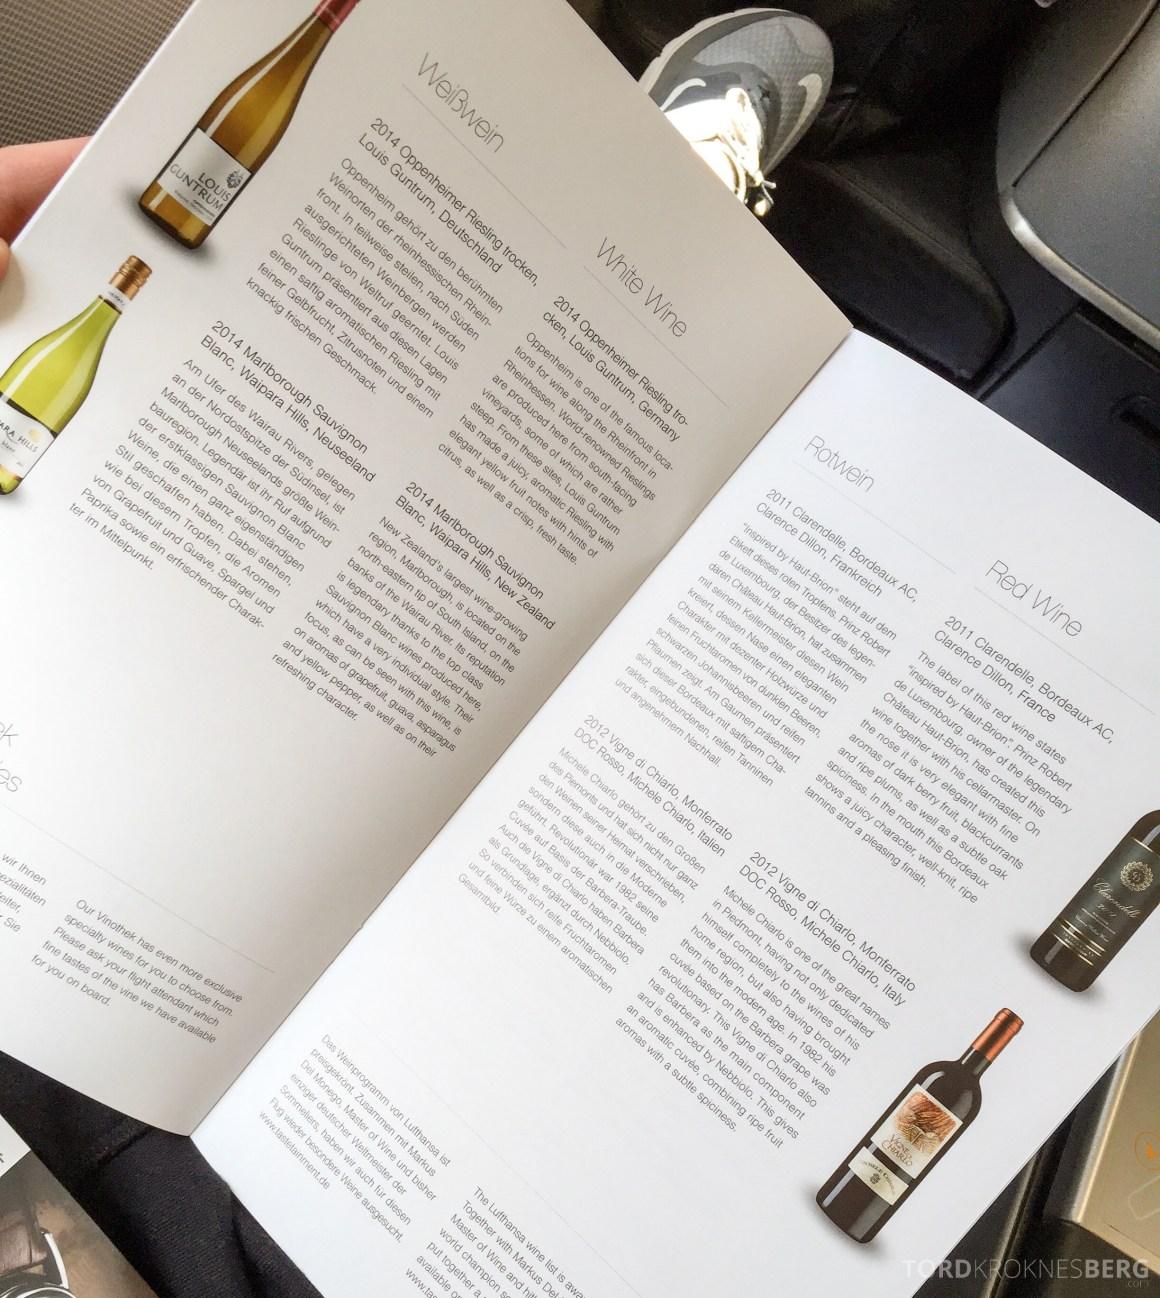 Lufthansa Business Class München til New York vinutvalg